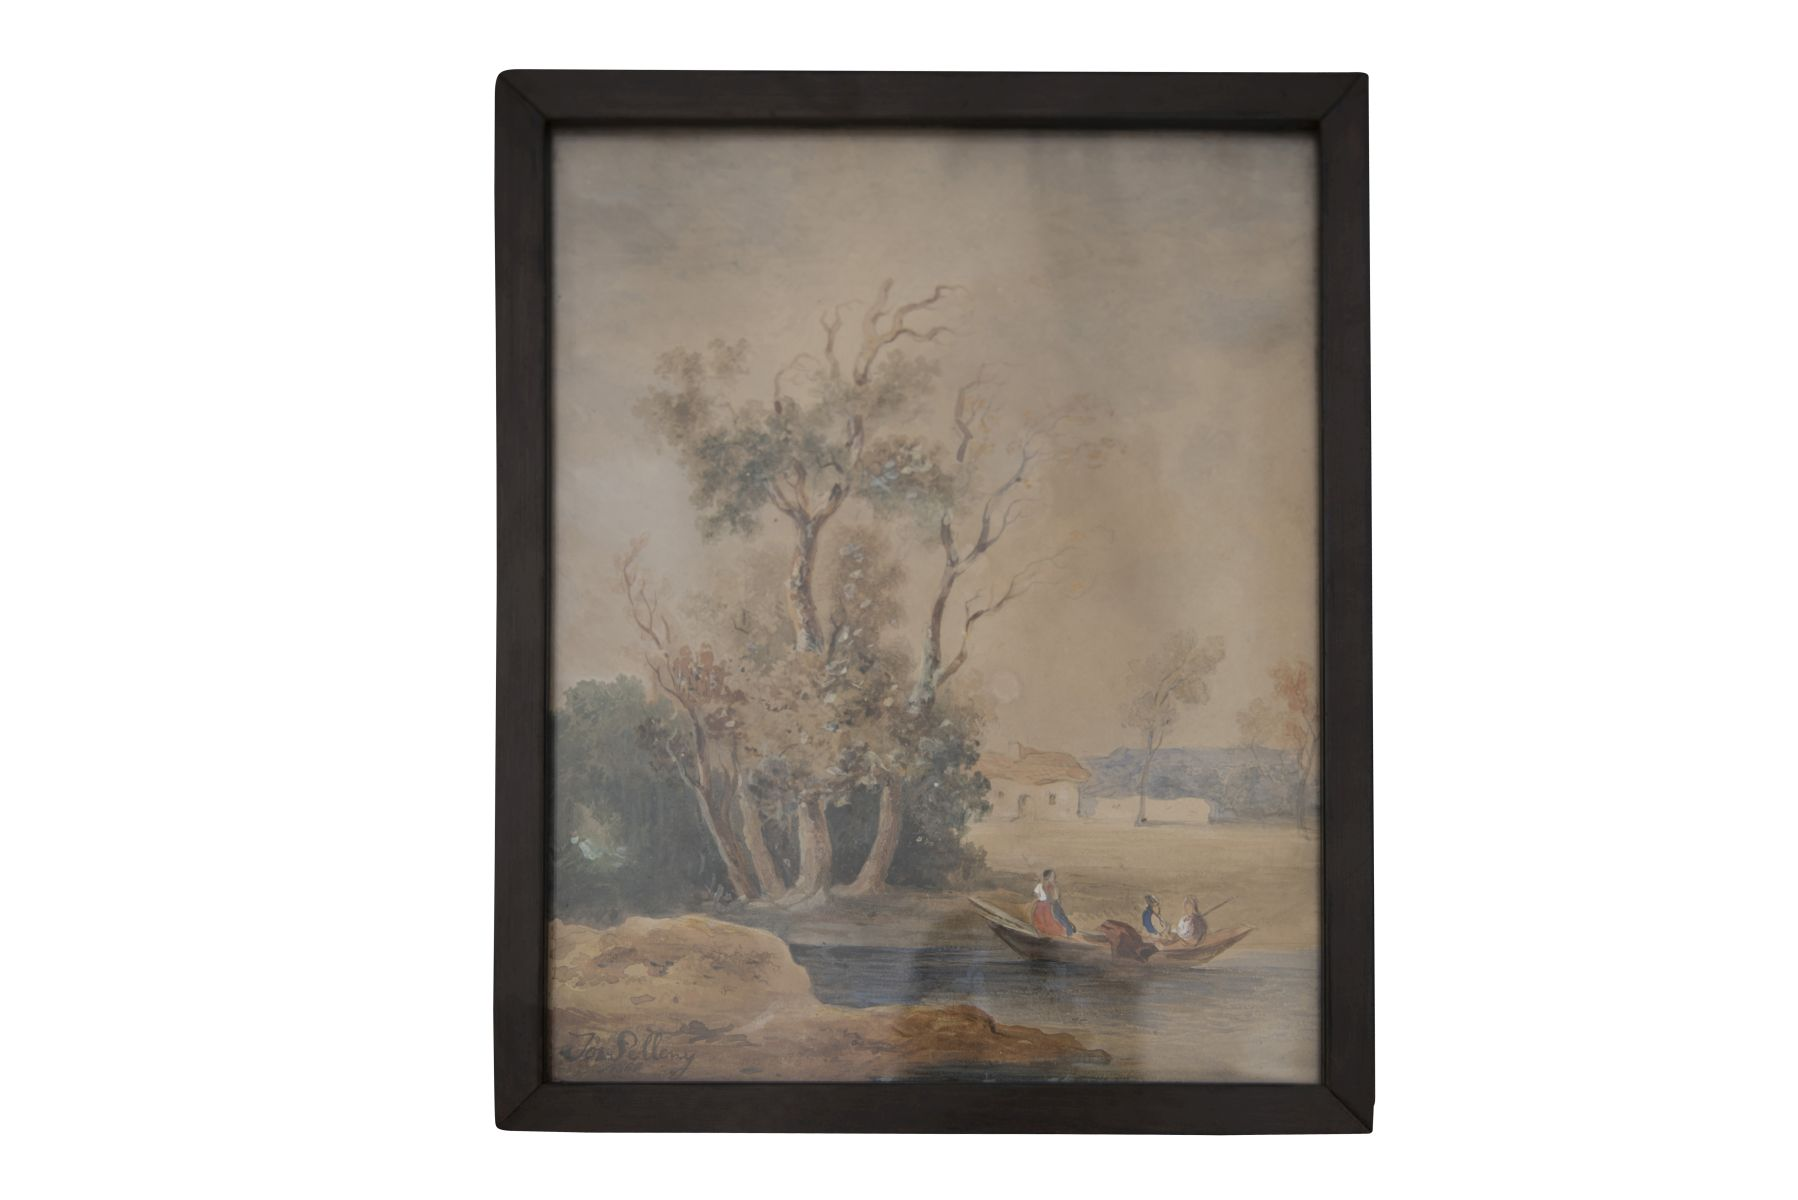 "#150 Joseph Selleny (1824-1875) ""River in a Southern Landscape"" | Joseph Selleny (1824-1875) ""Fluss in südlicher Landschaft"" Image"